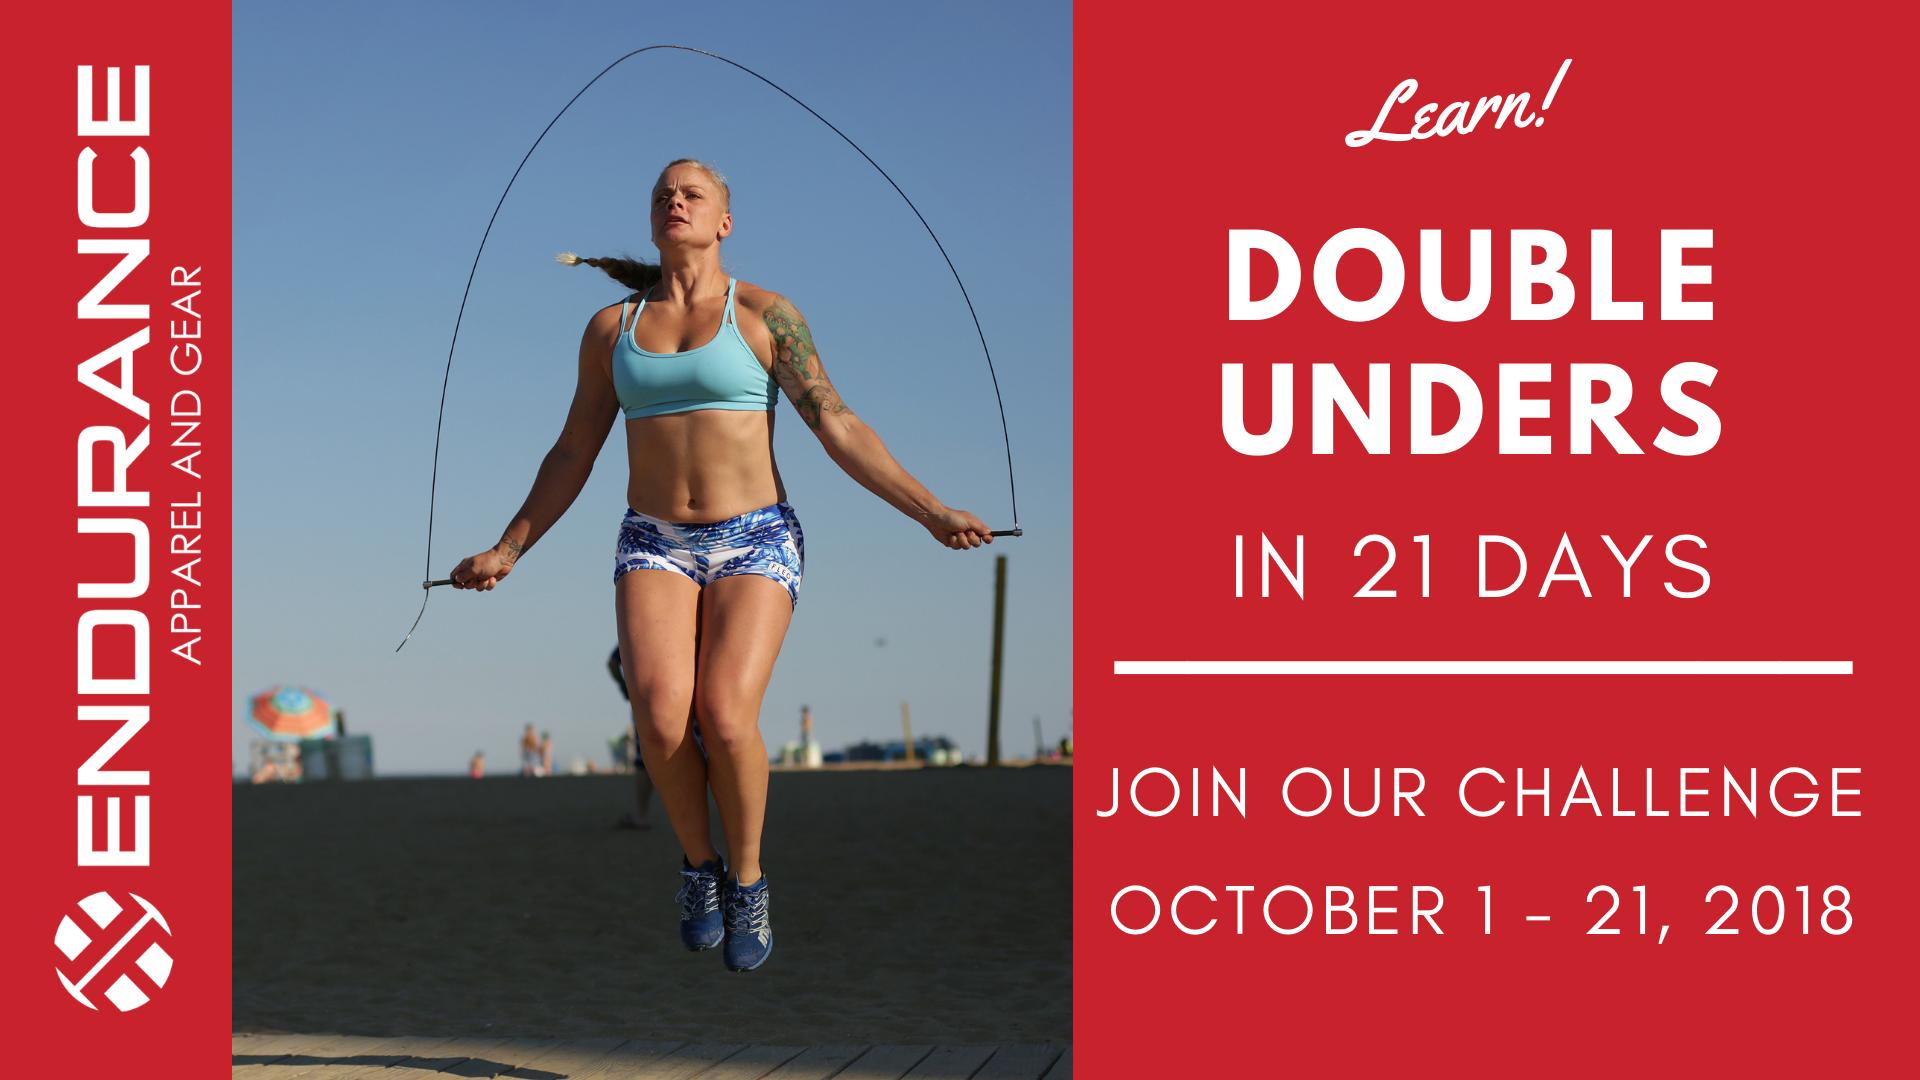 Learn Double Unders in 21 Days